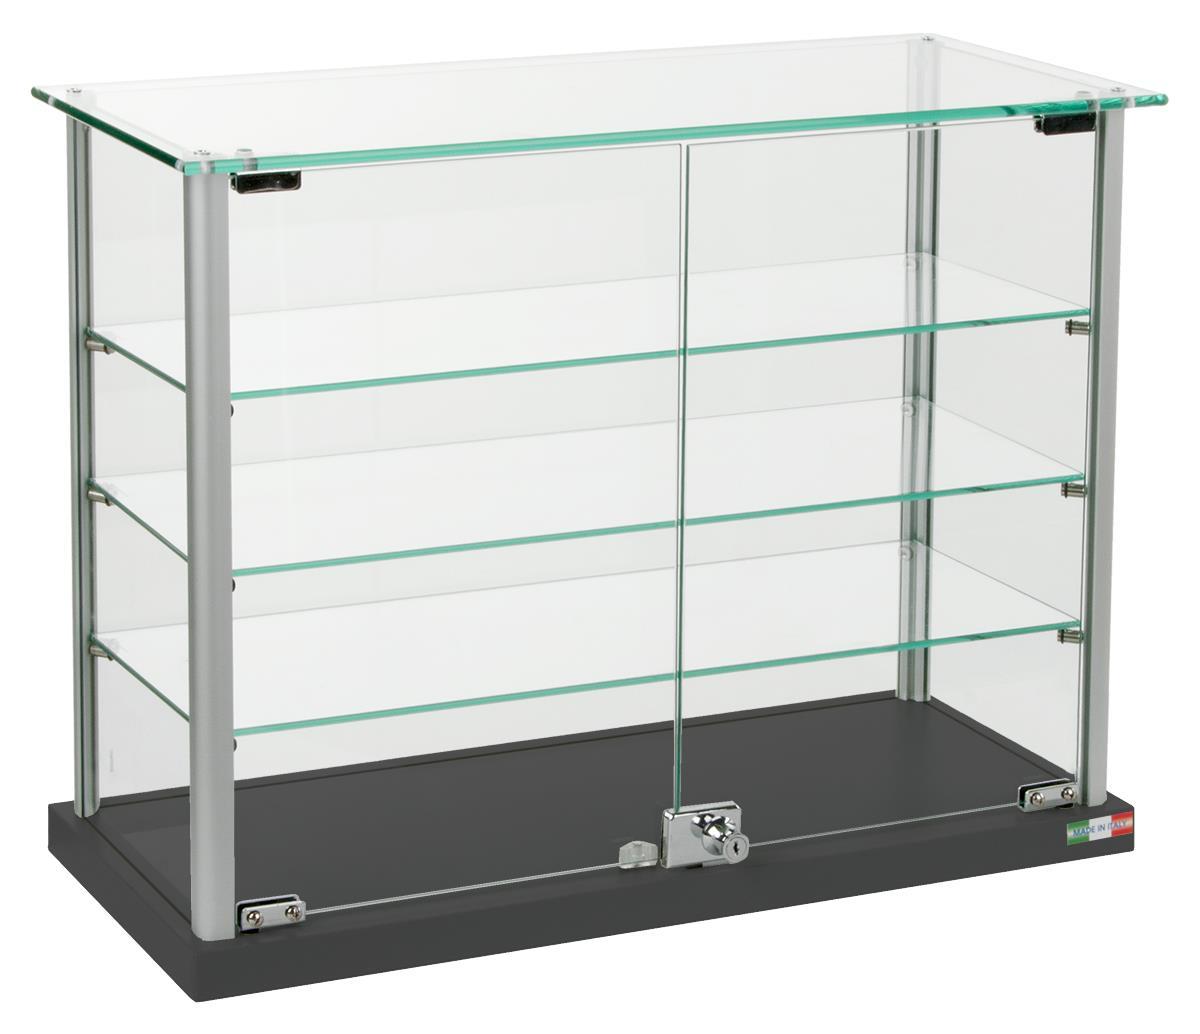 Countertop Display Case 3 Height Adjustable Shelves